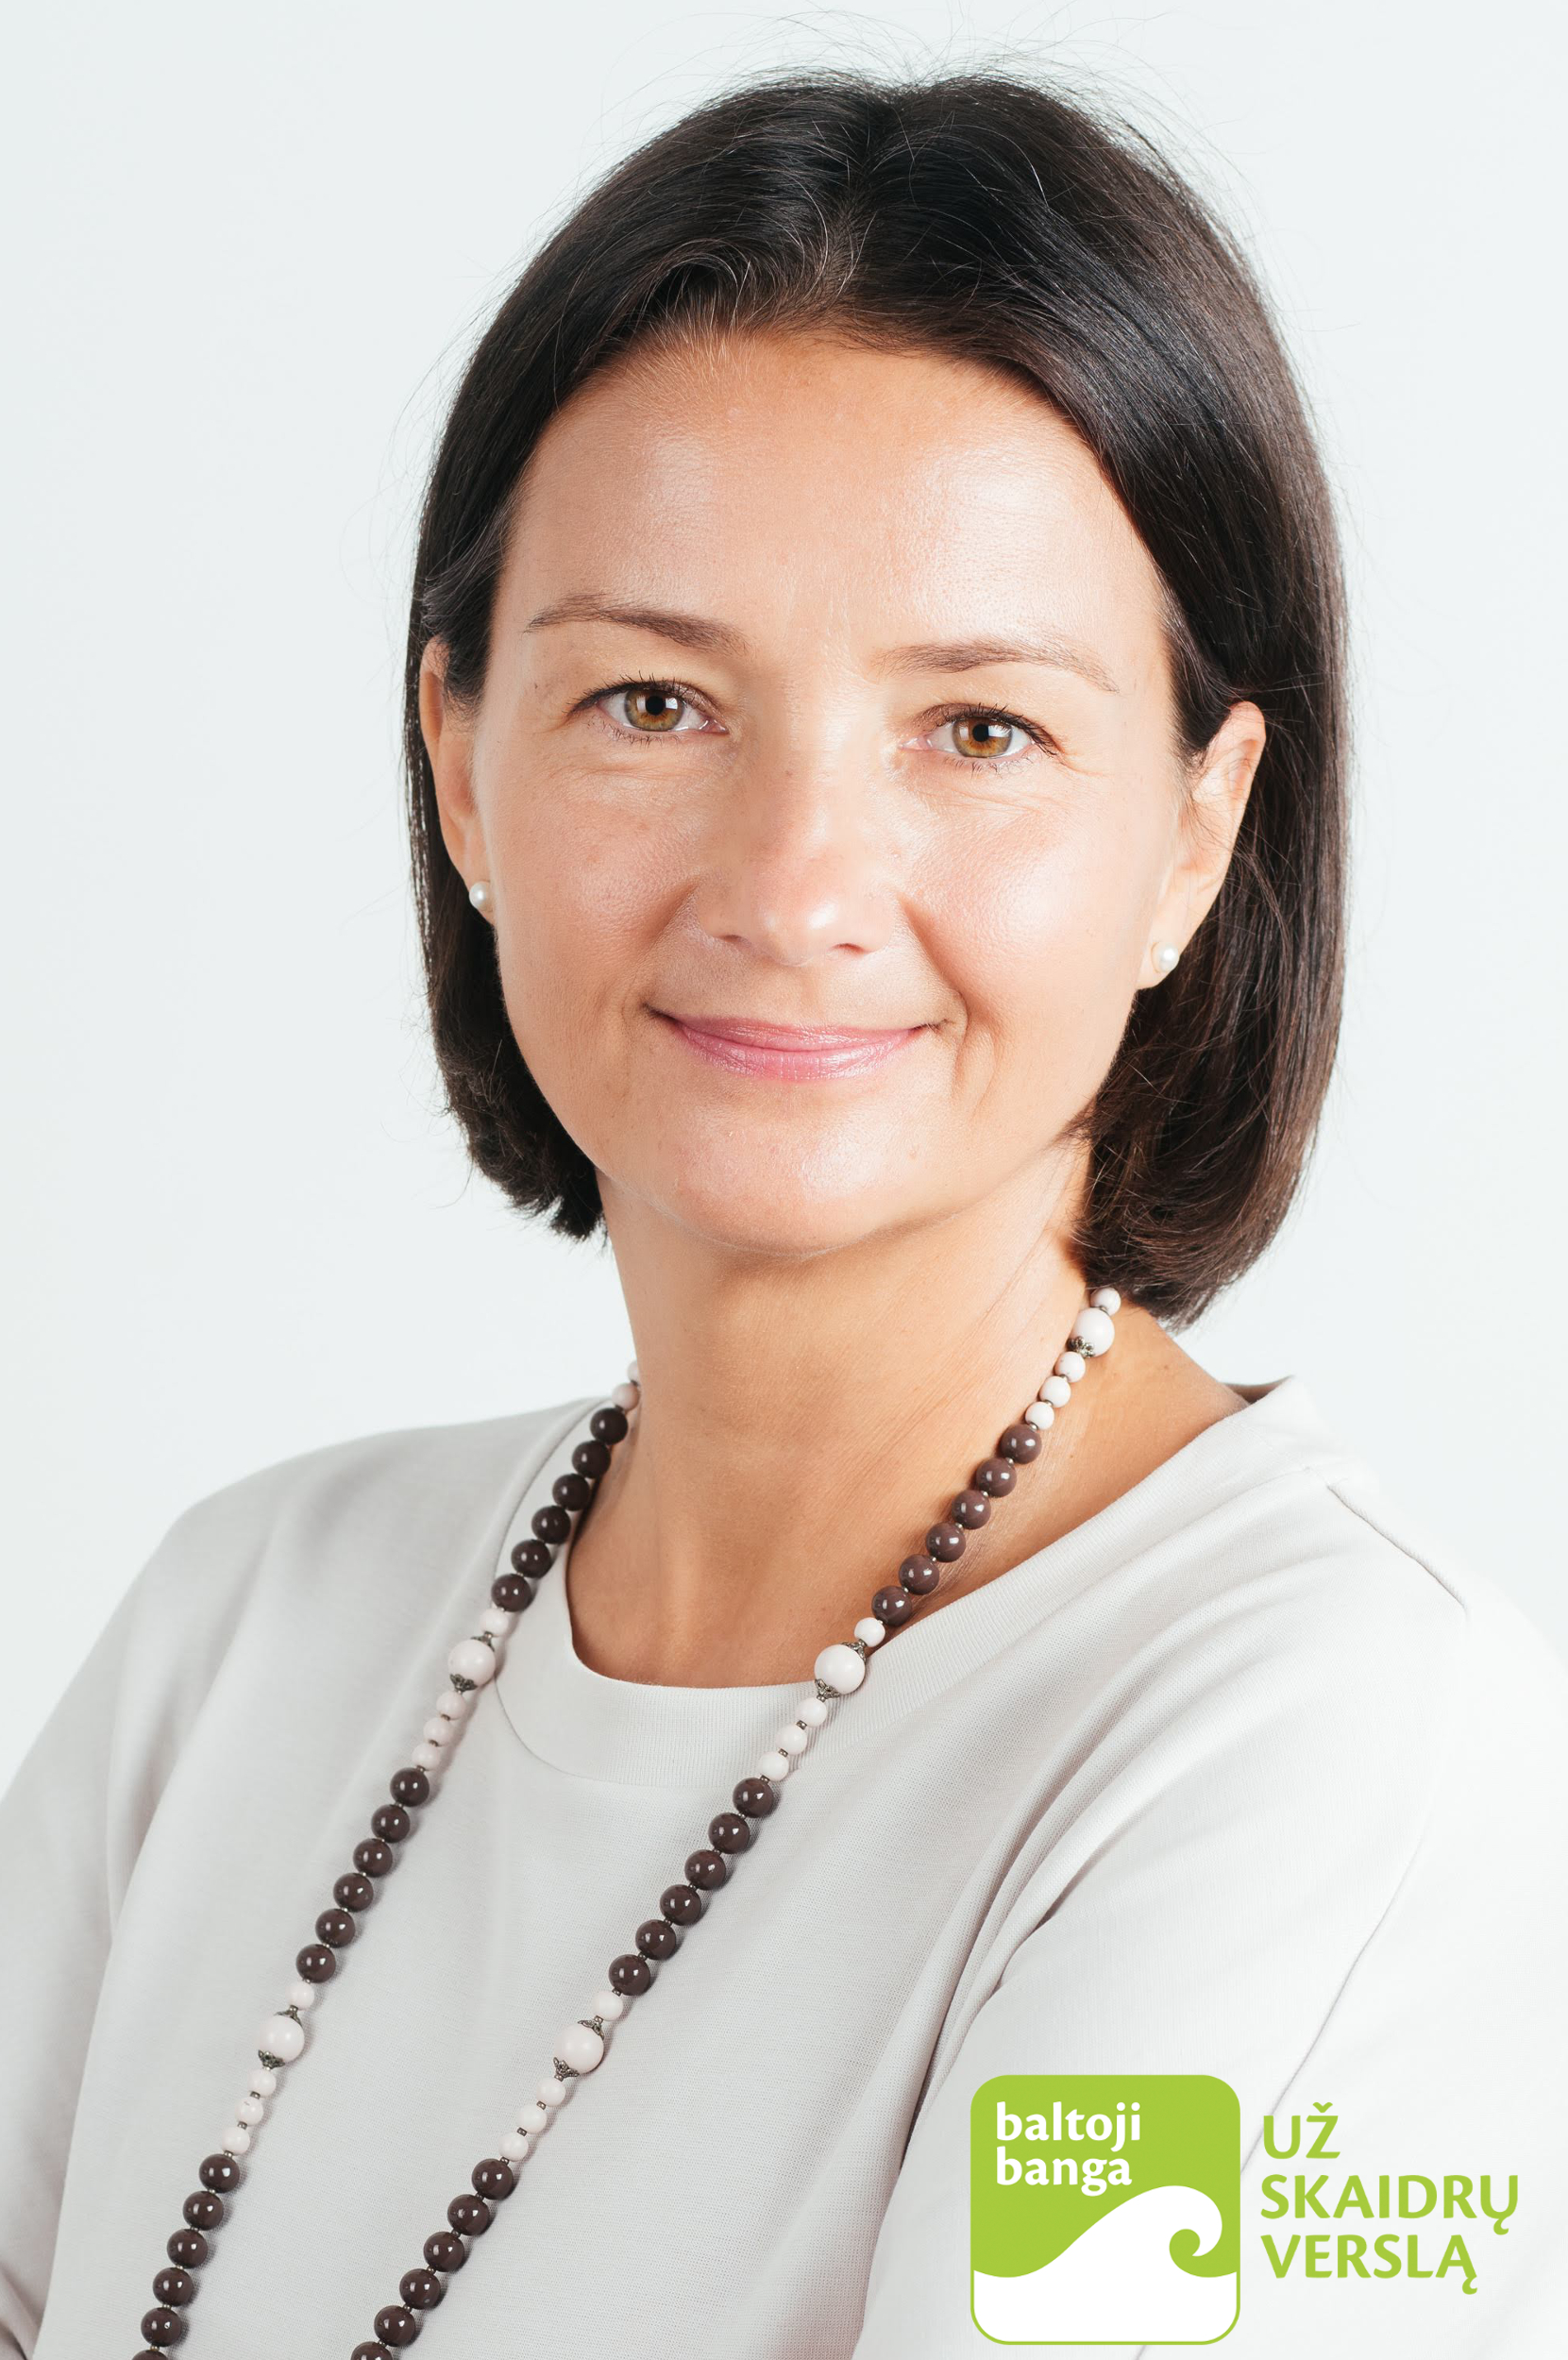 JurgaBusiliene